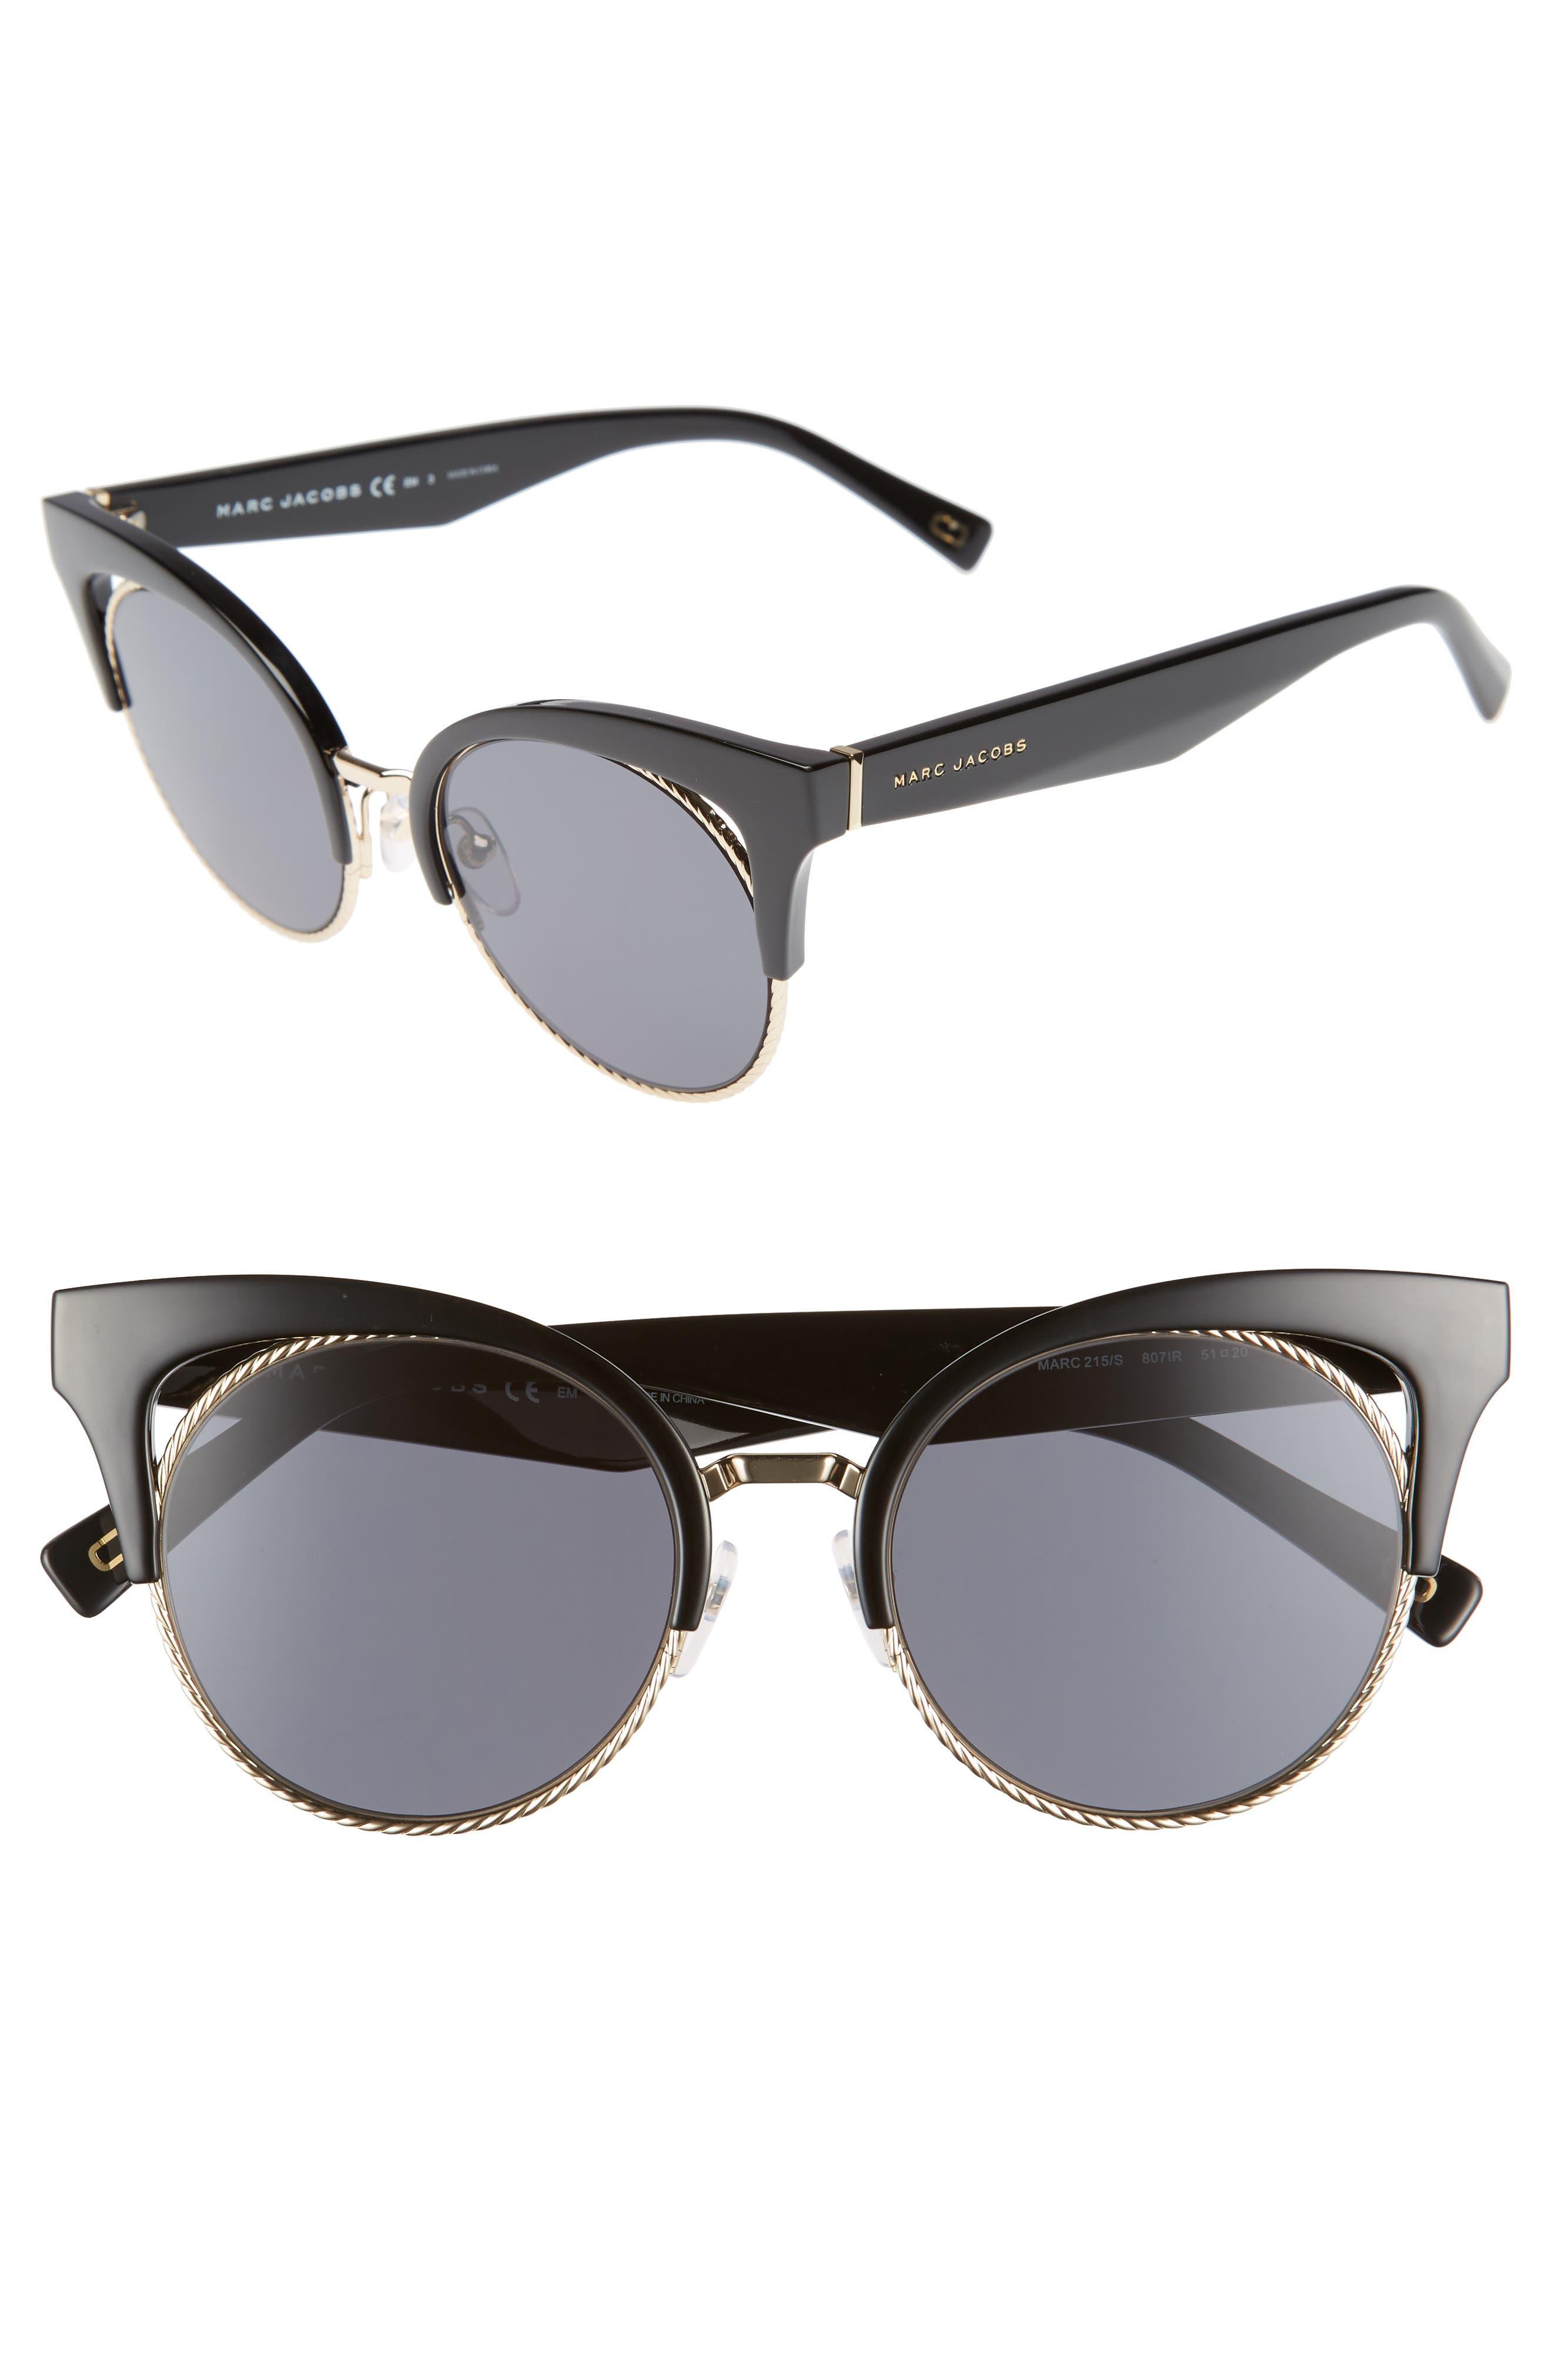 51mm Gradient Lens Cat Eye Sunglasses,                         Main,                         color,